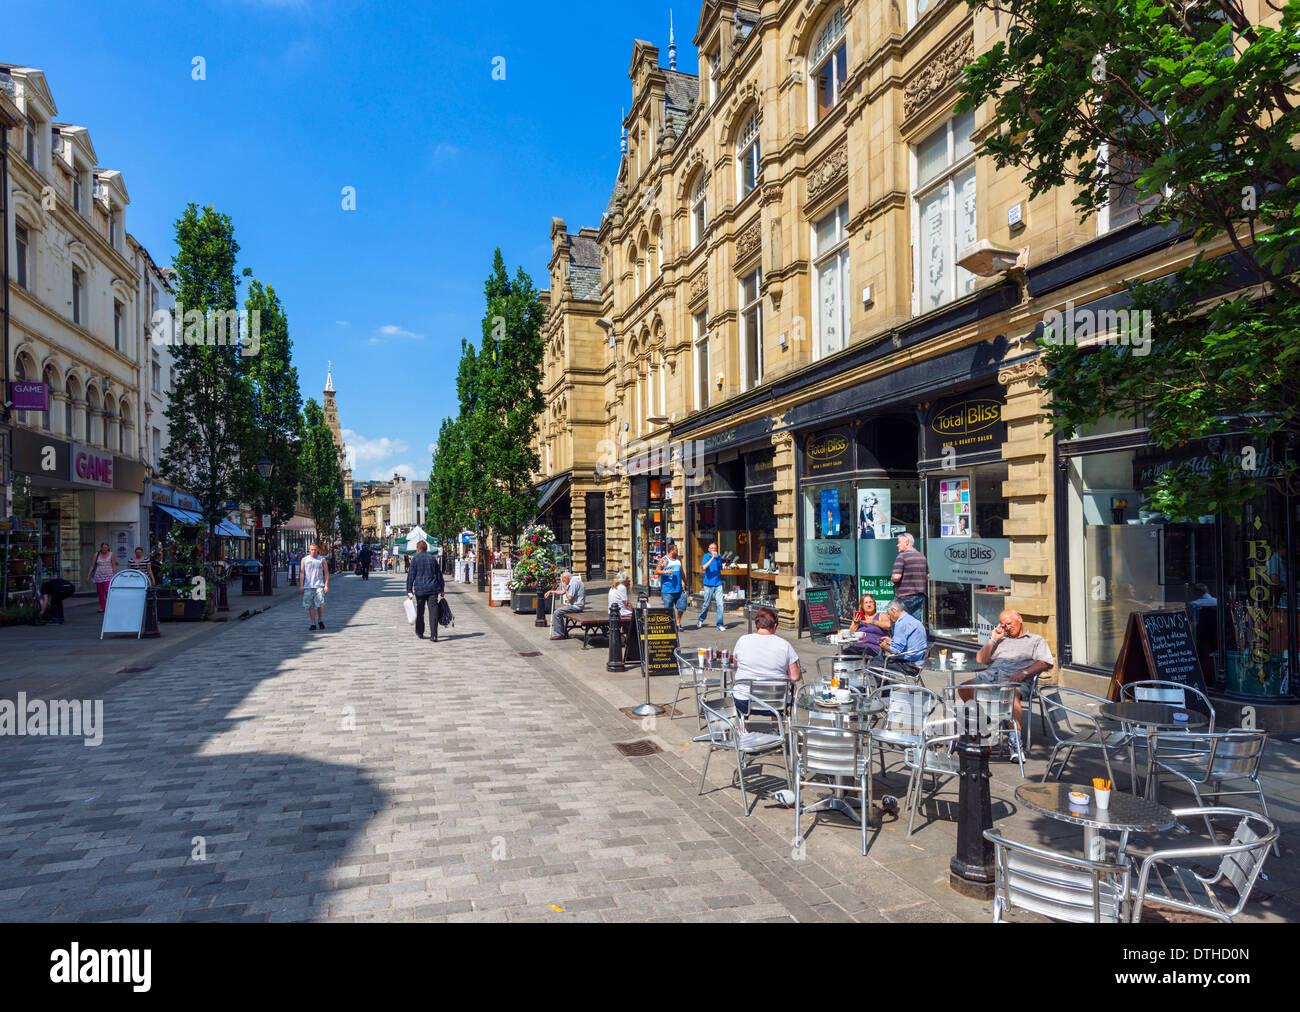 Halifax west yorkshire united kingdom